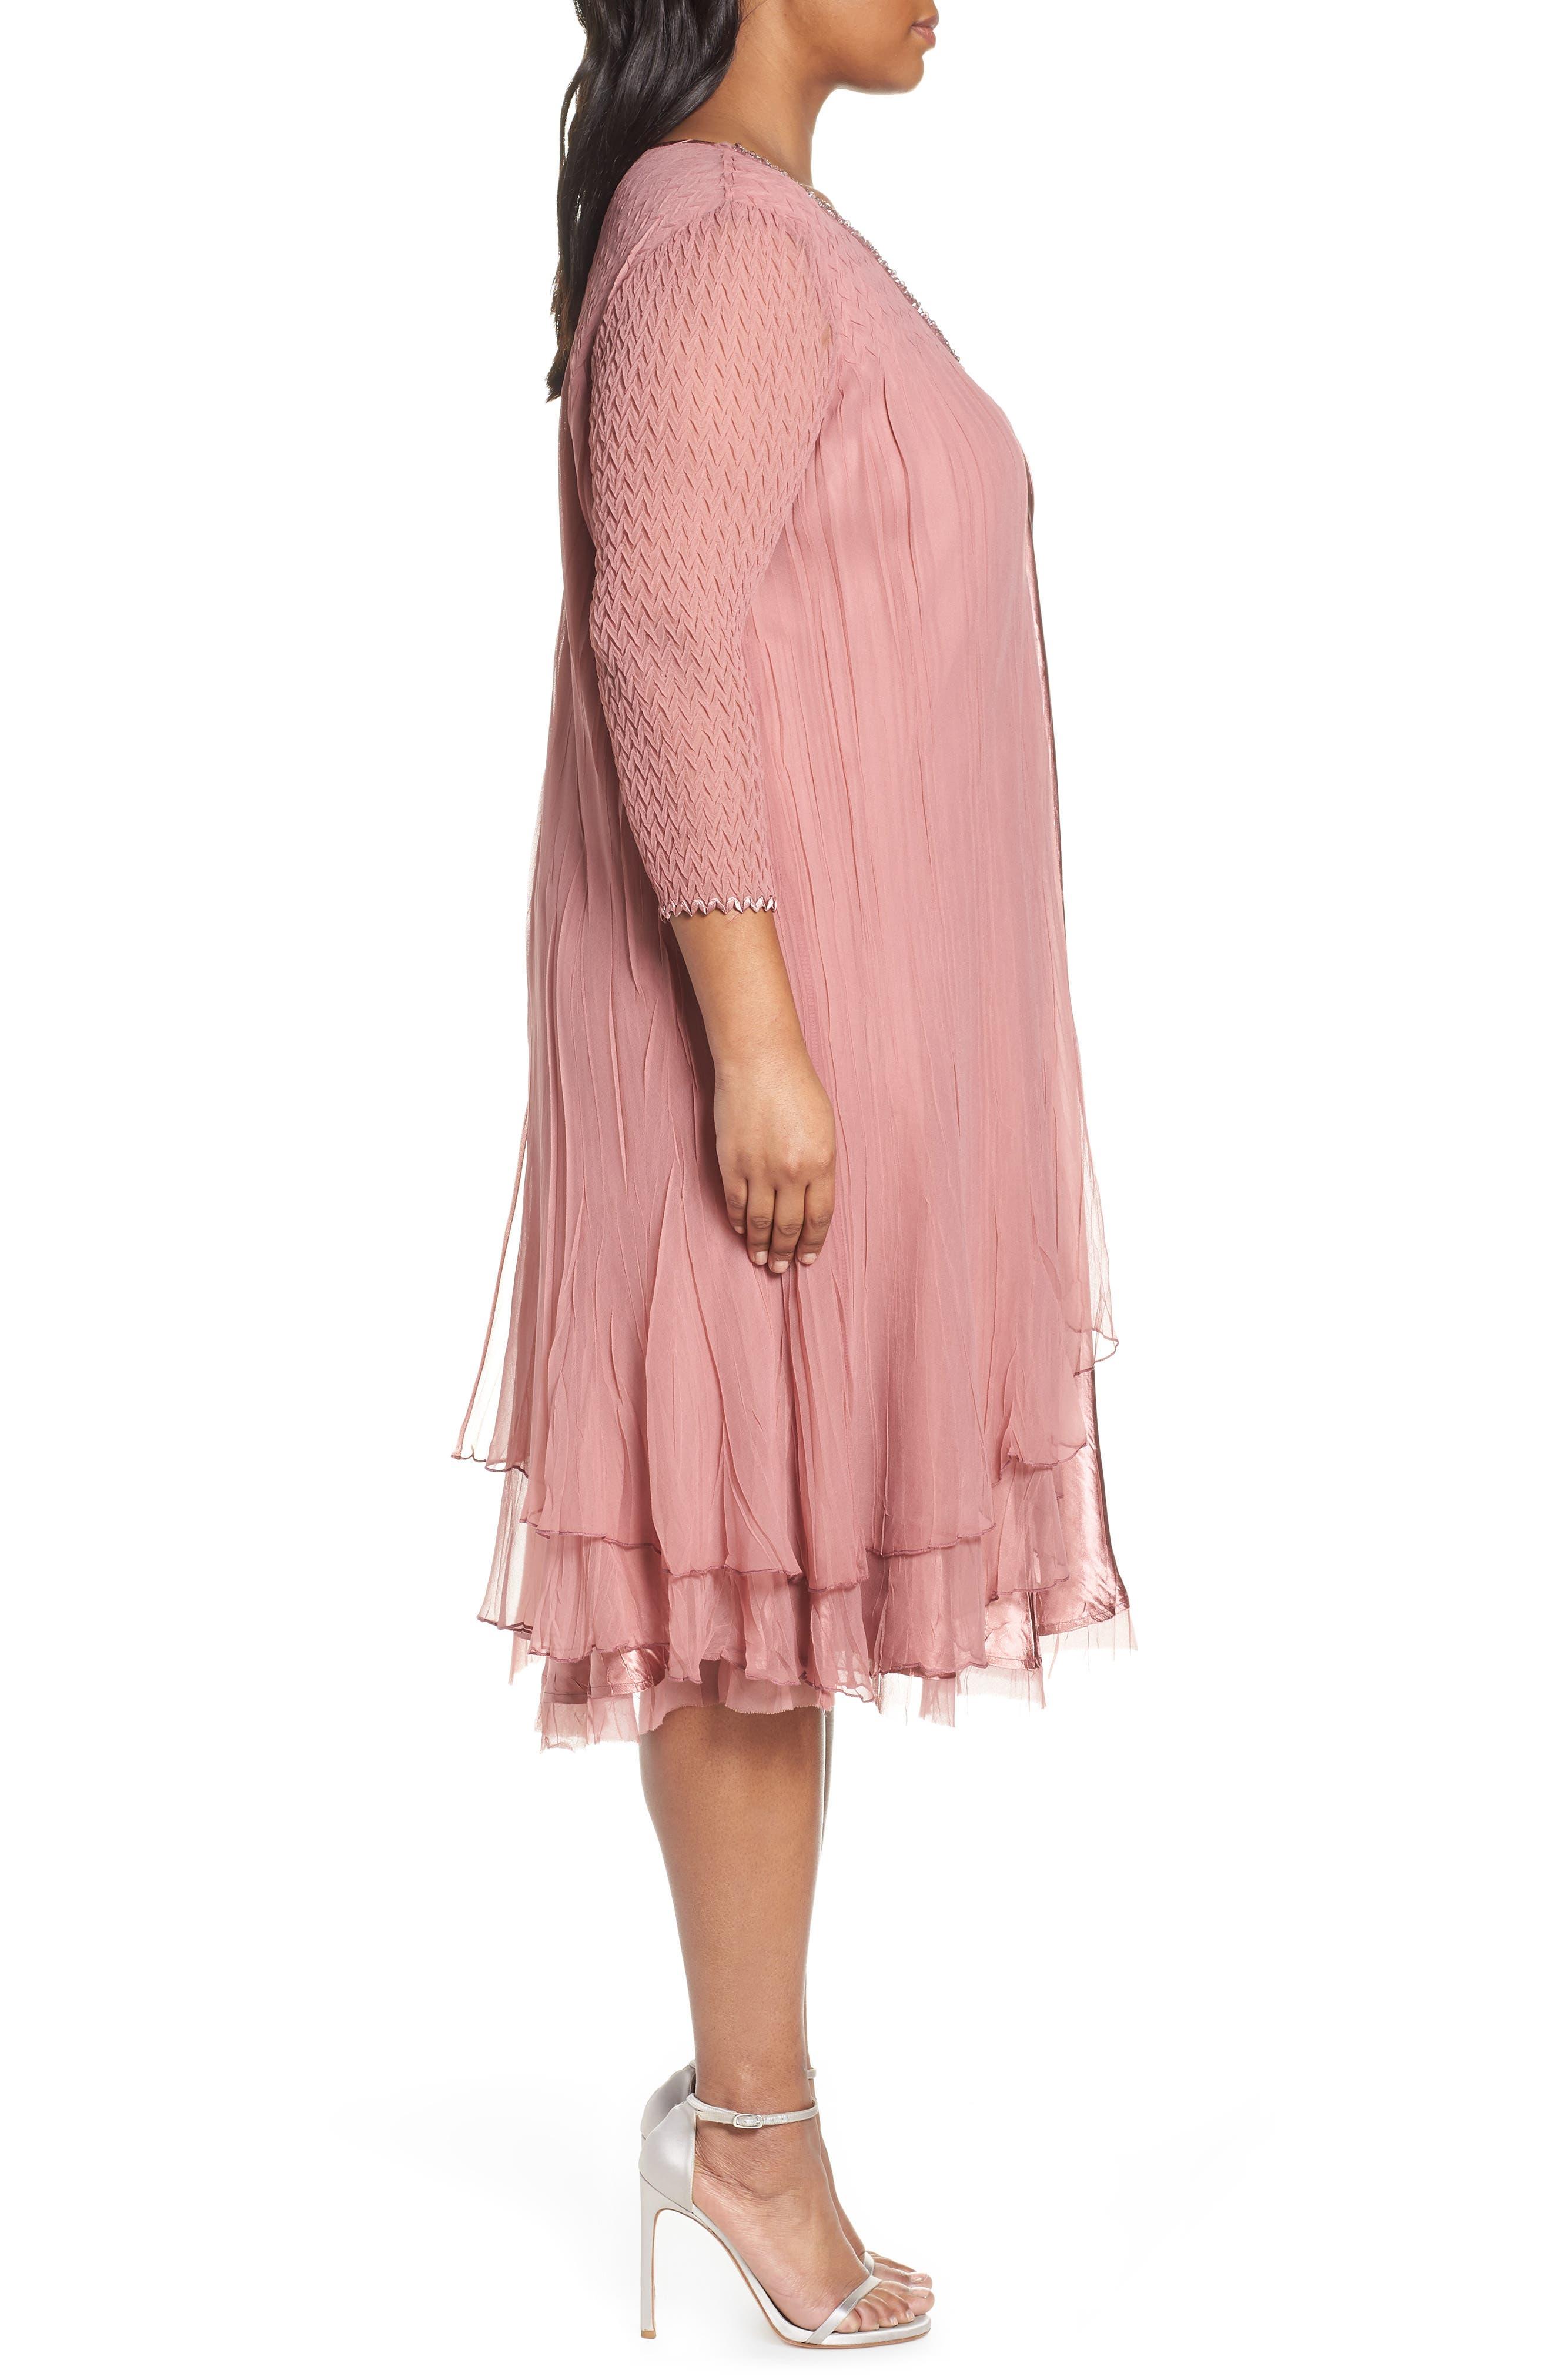 KOMAROV, Tiered A-Line Dress, Alternate thumbnail 4, color, 680